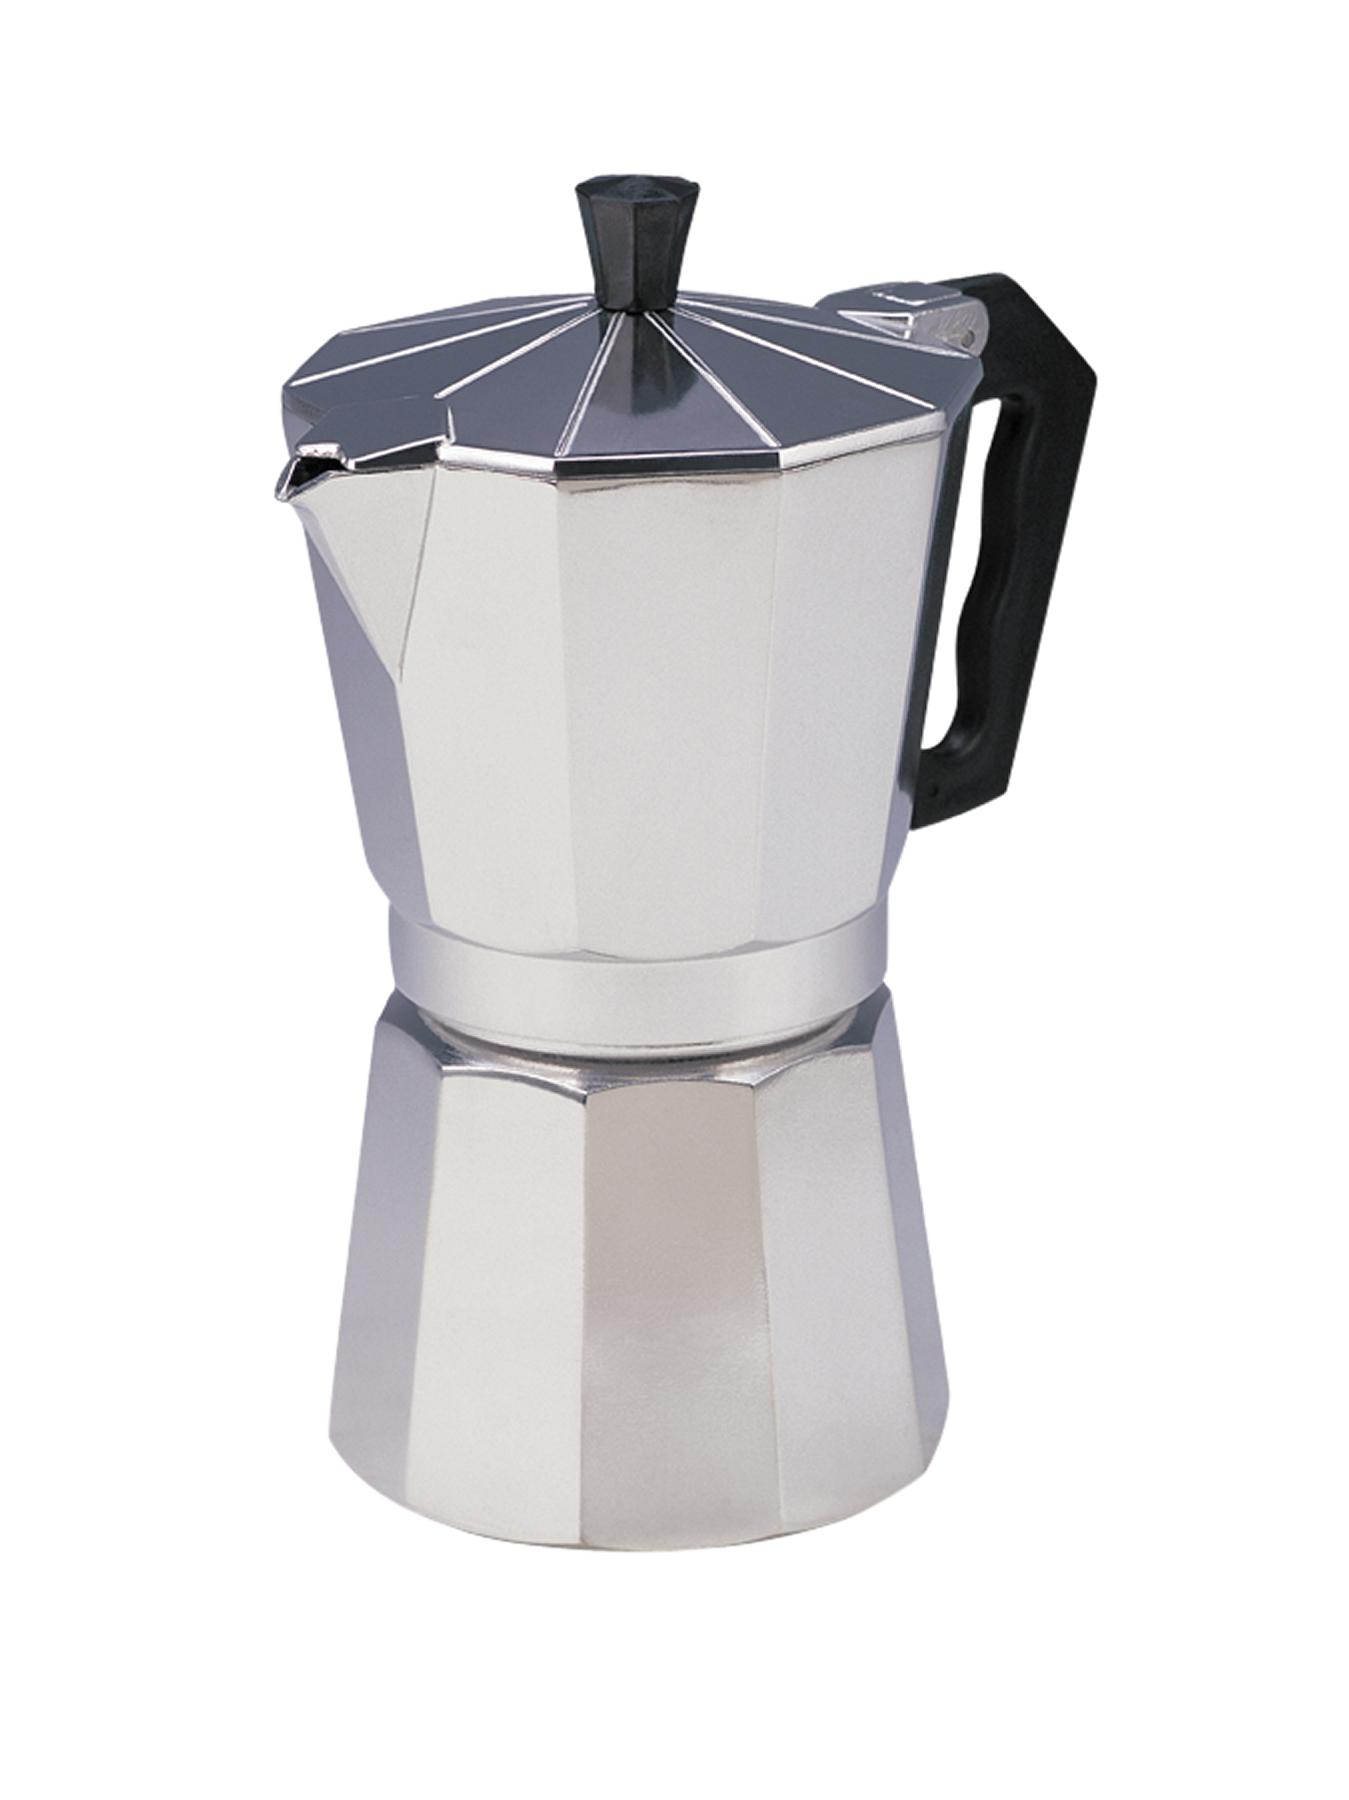 Buy Cheap Coffee Percolator Compare Coffee Makers Prices